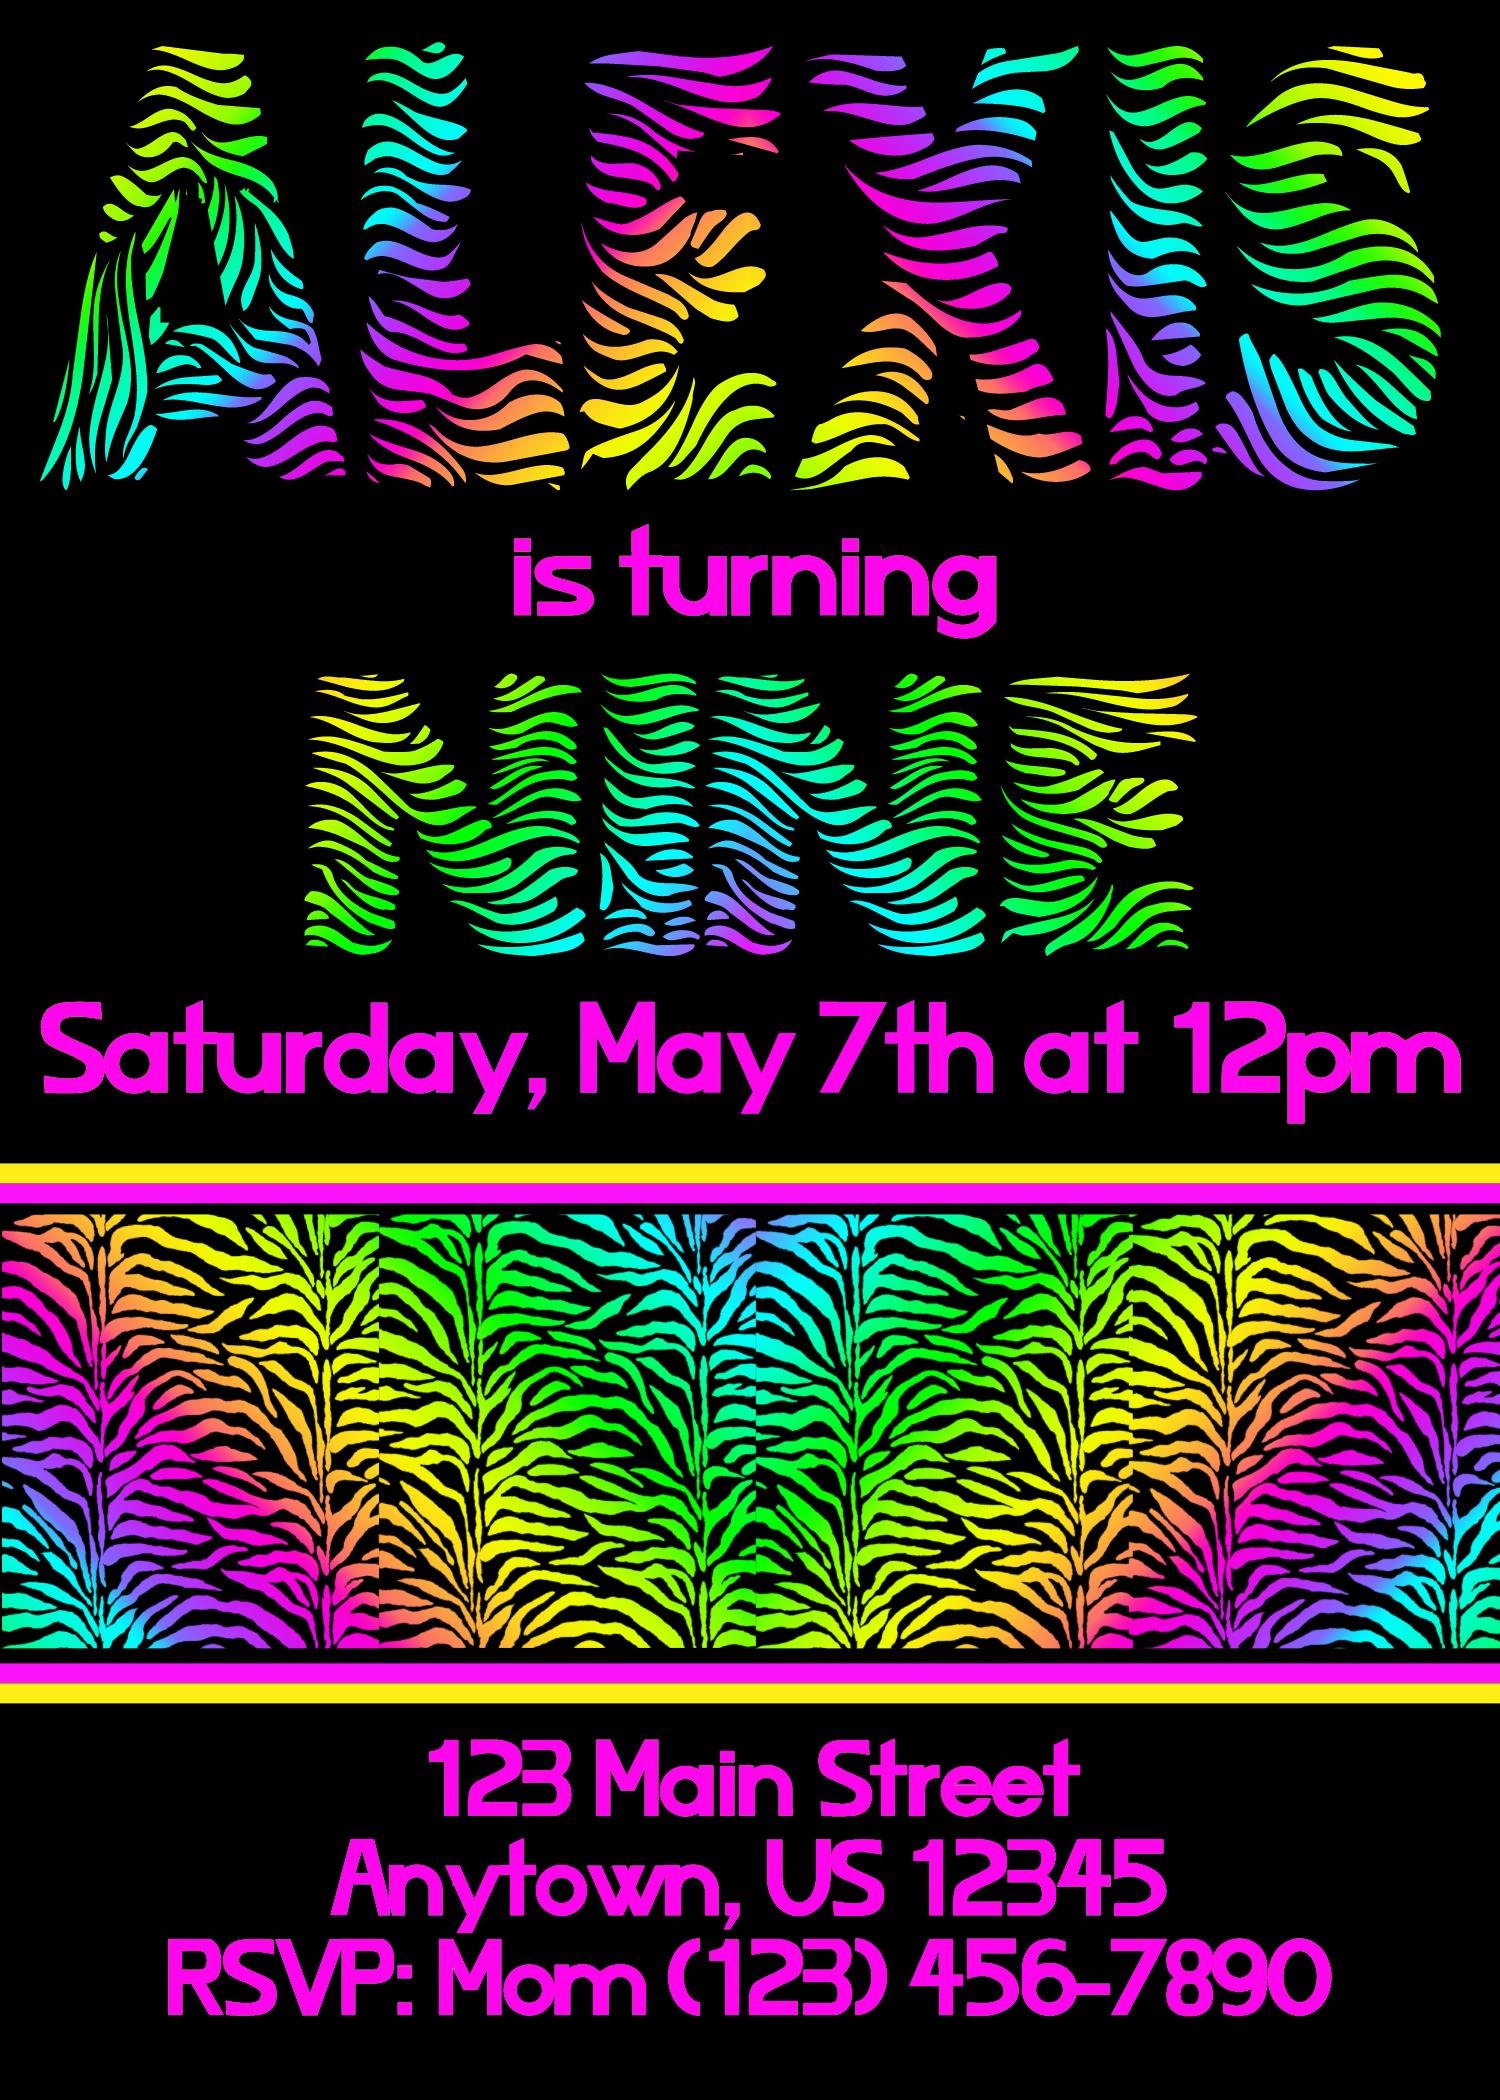 neon zebra party invitations two blue pillars